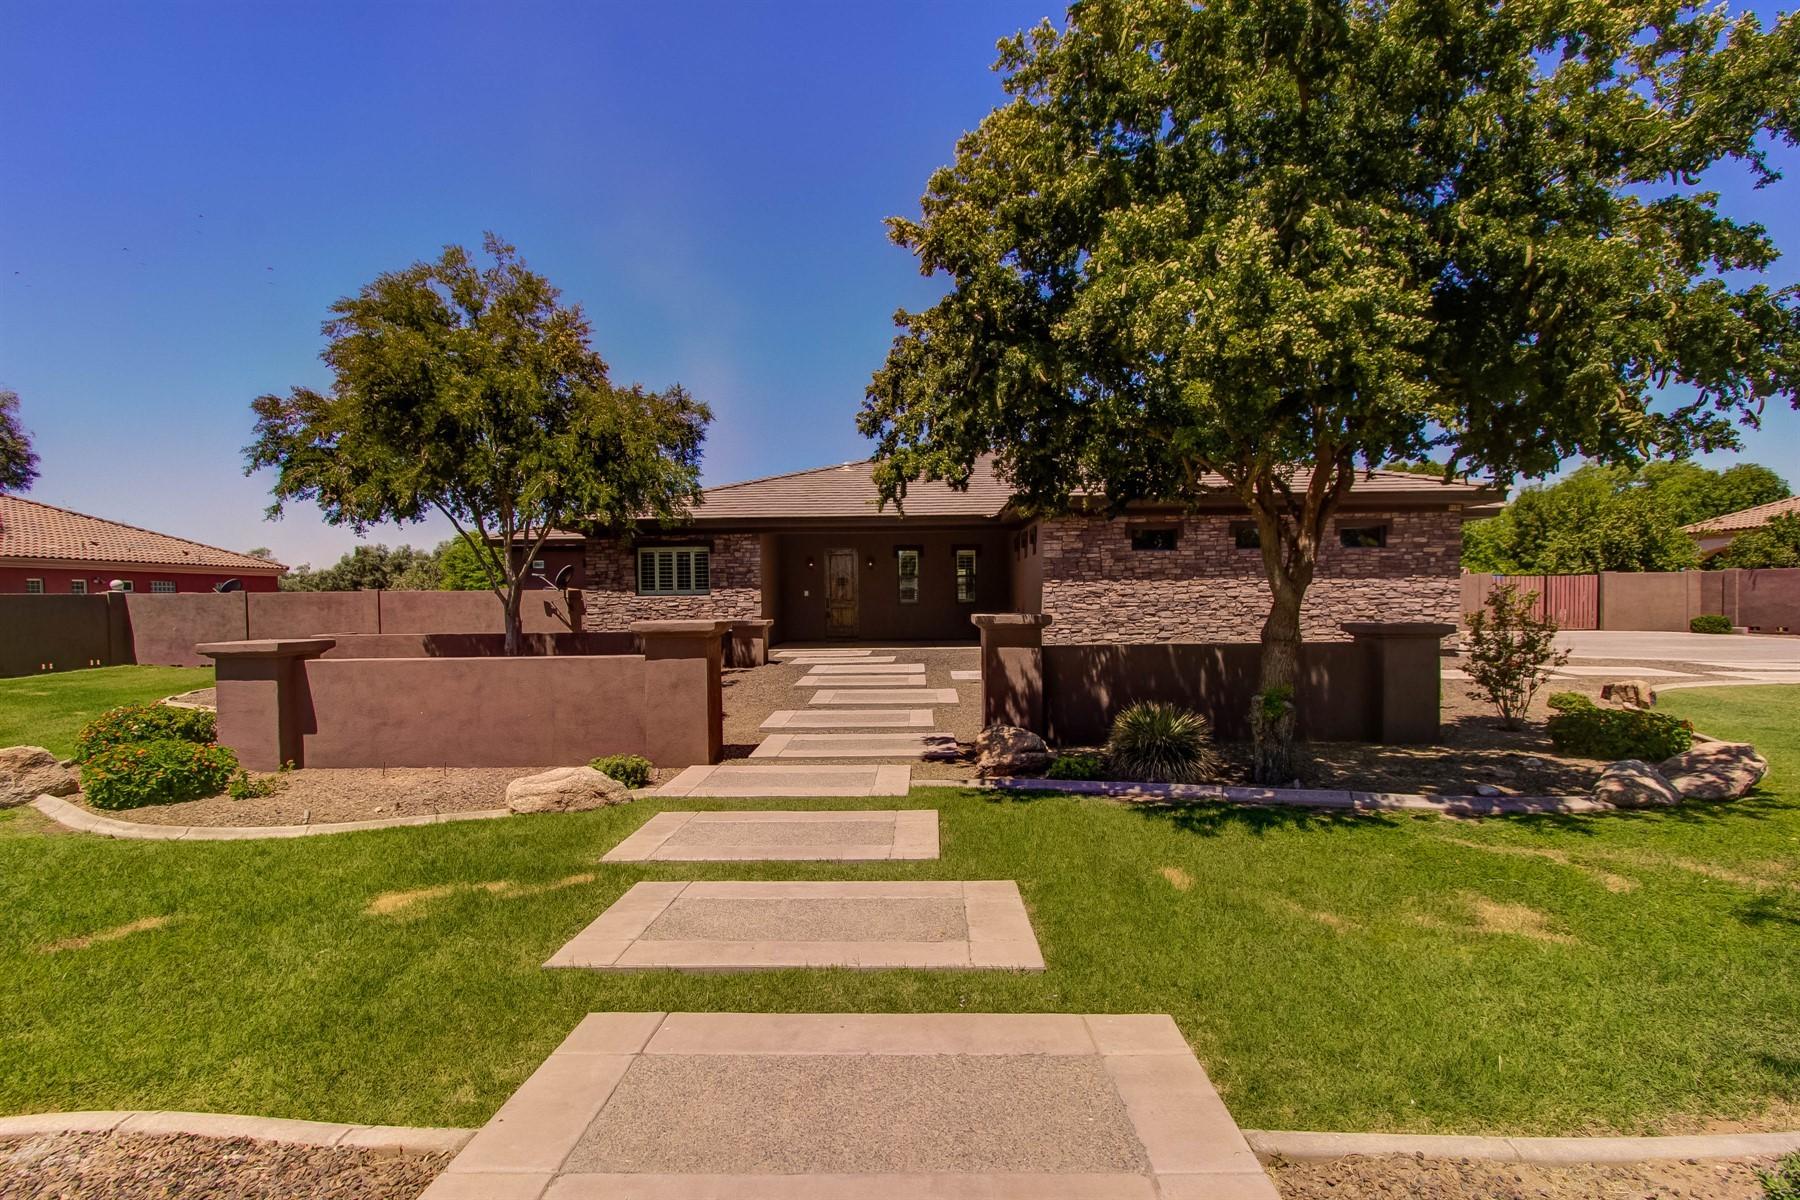 Single Family Homes por un Venta en Lovely Semi-Custom Home With Views 6136 N 171ST LN Waddell, Arizona 85355 Estados Unidos